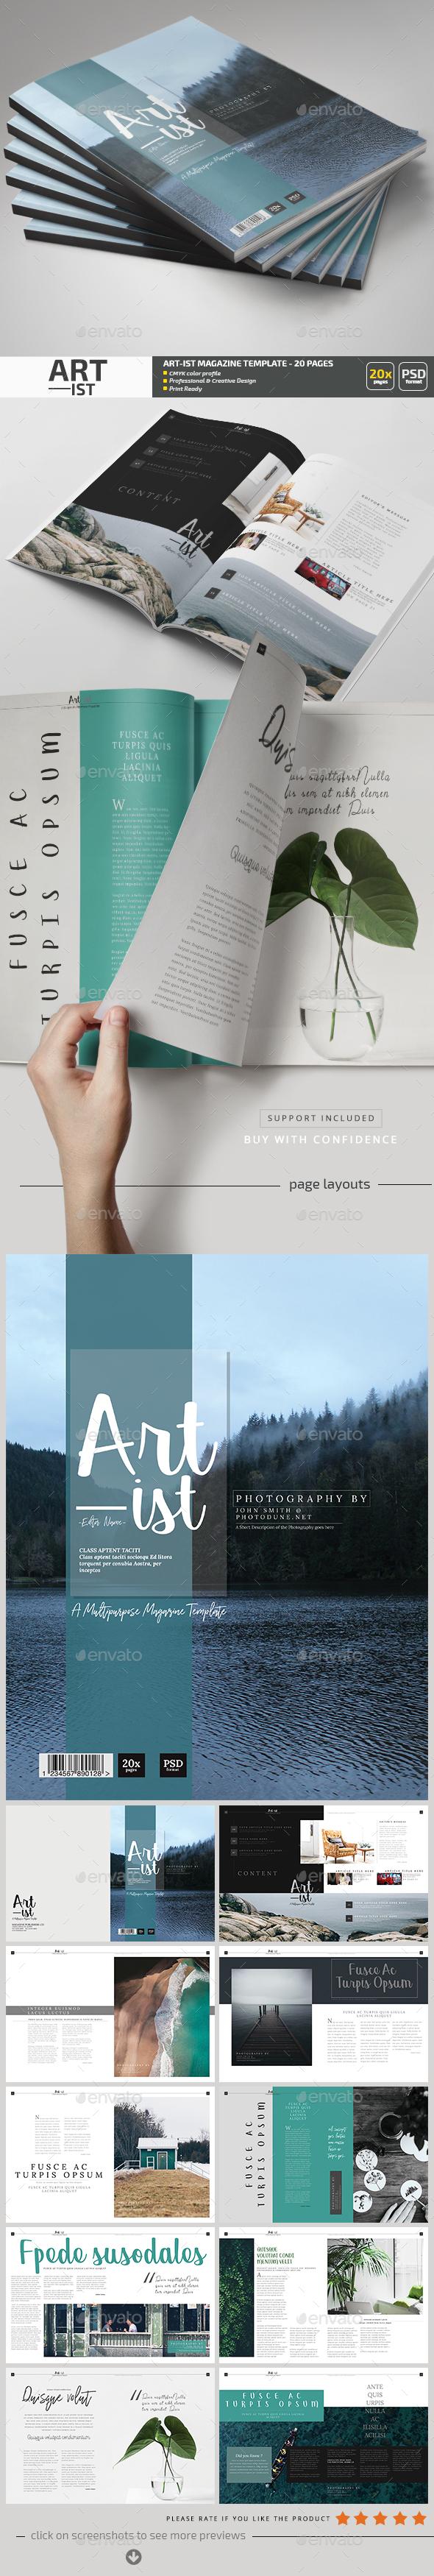 Art-ist Magazine Template V.14 - Magazines Print Templates